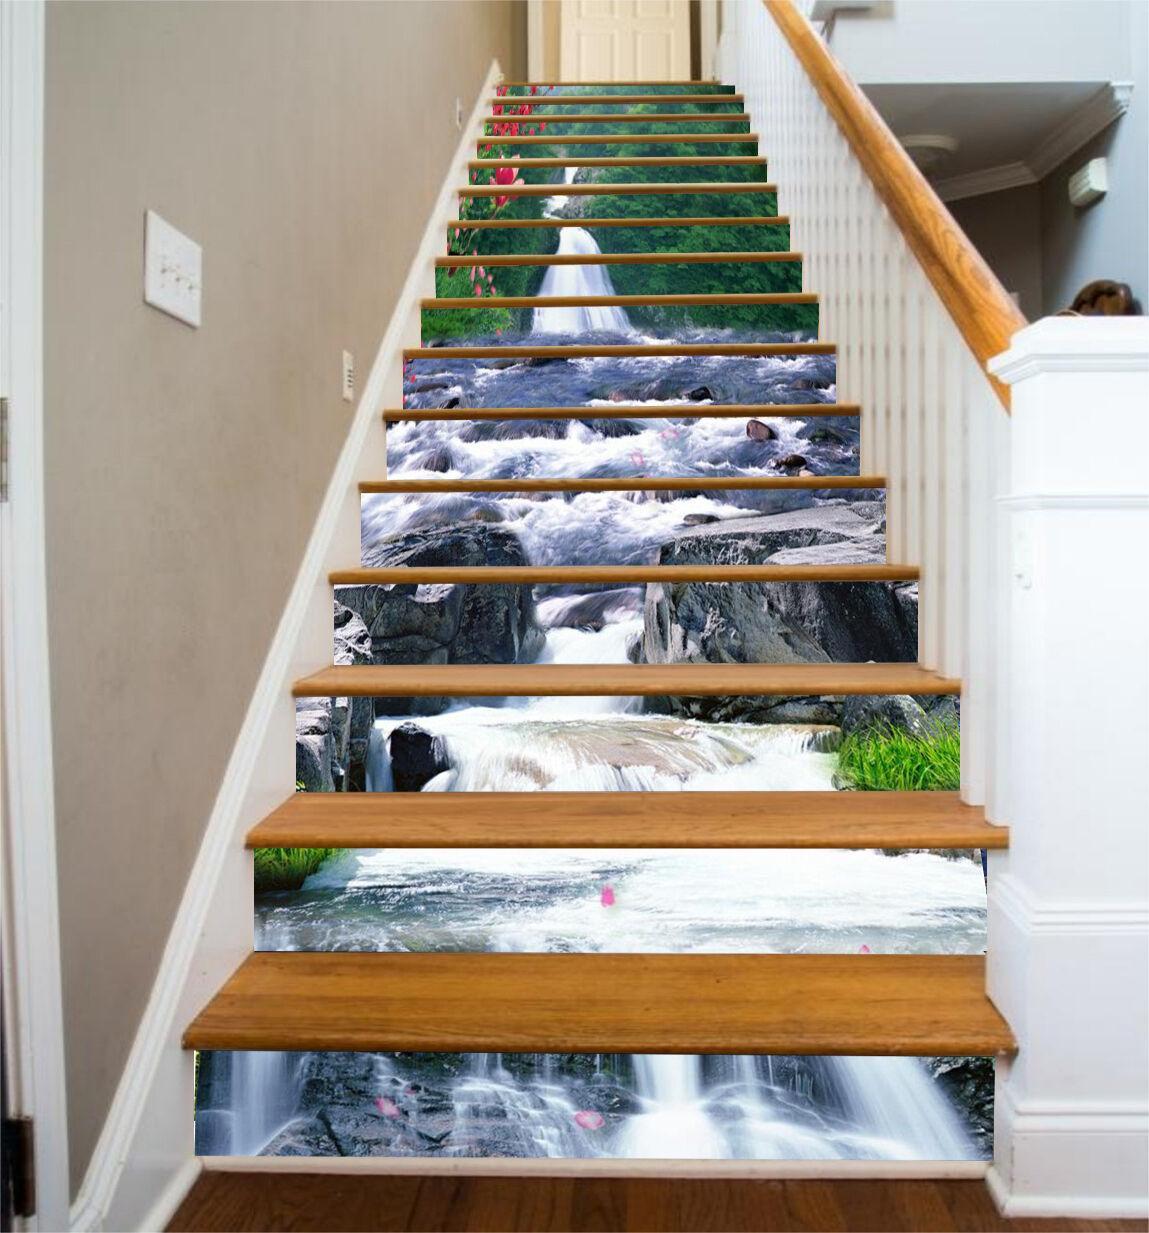 3D Landscape Streams 6436 Risers Decoration Photo Mural Vinyl Decal Wallpaper CA